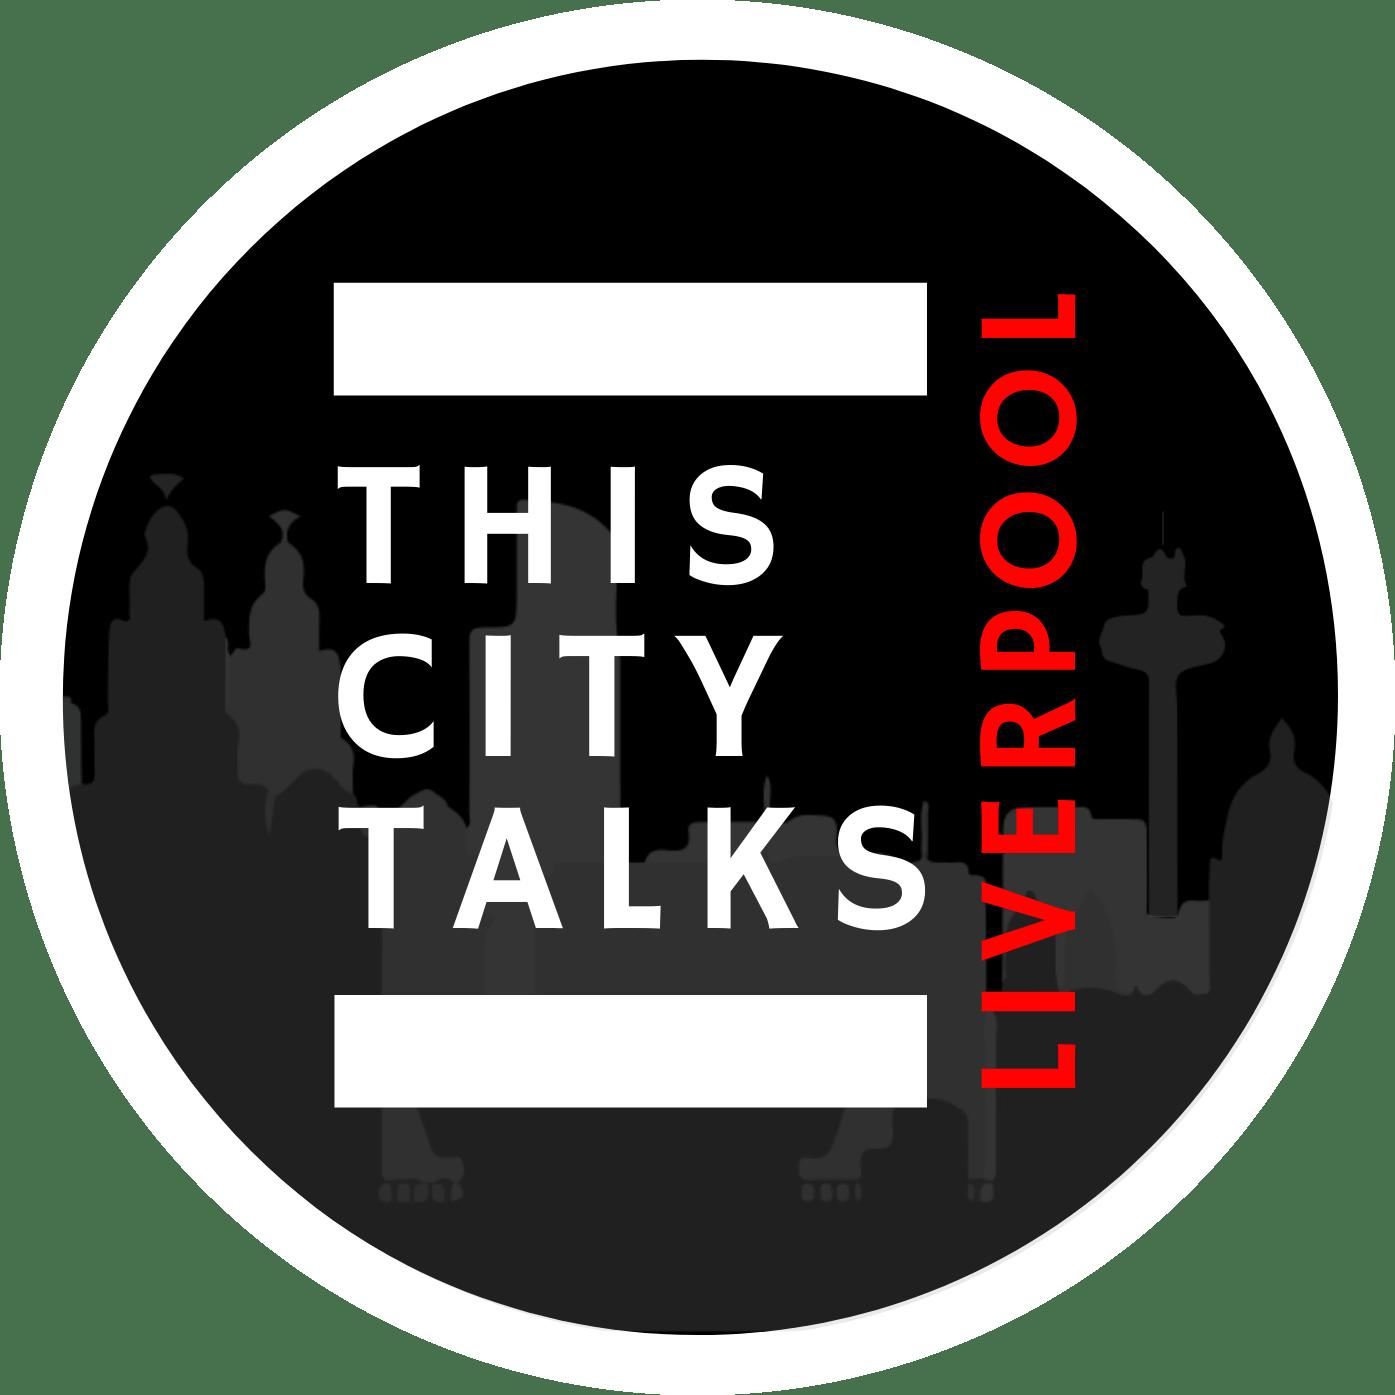 This City Talks